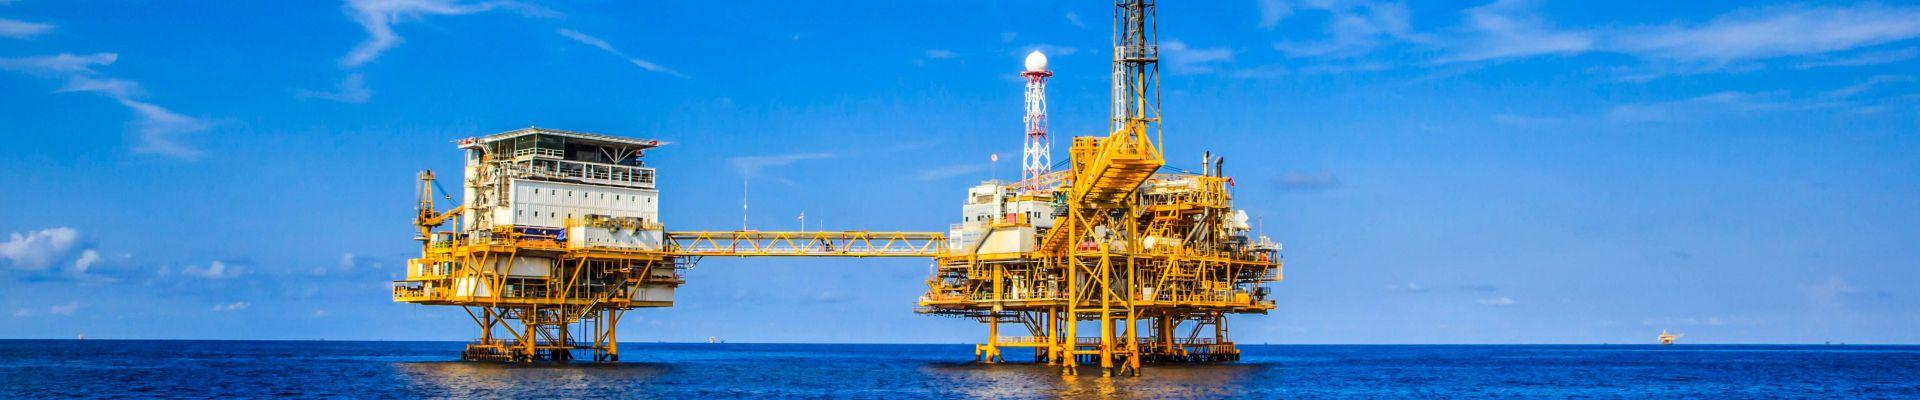 Offshore-Ölplattform